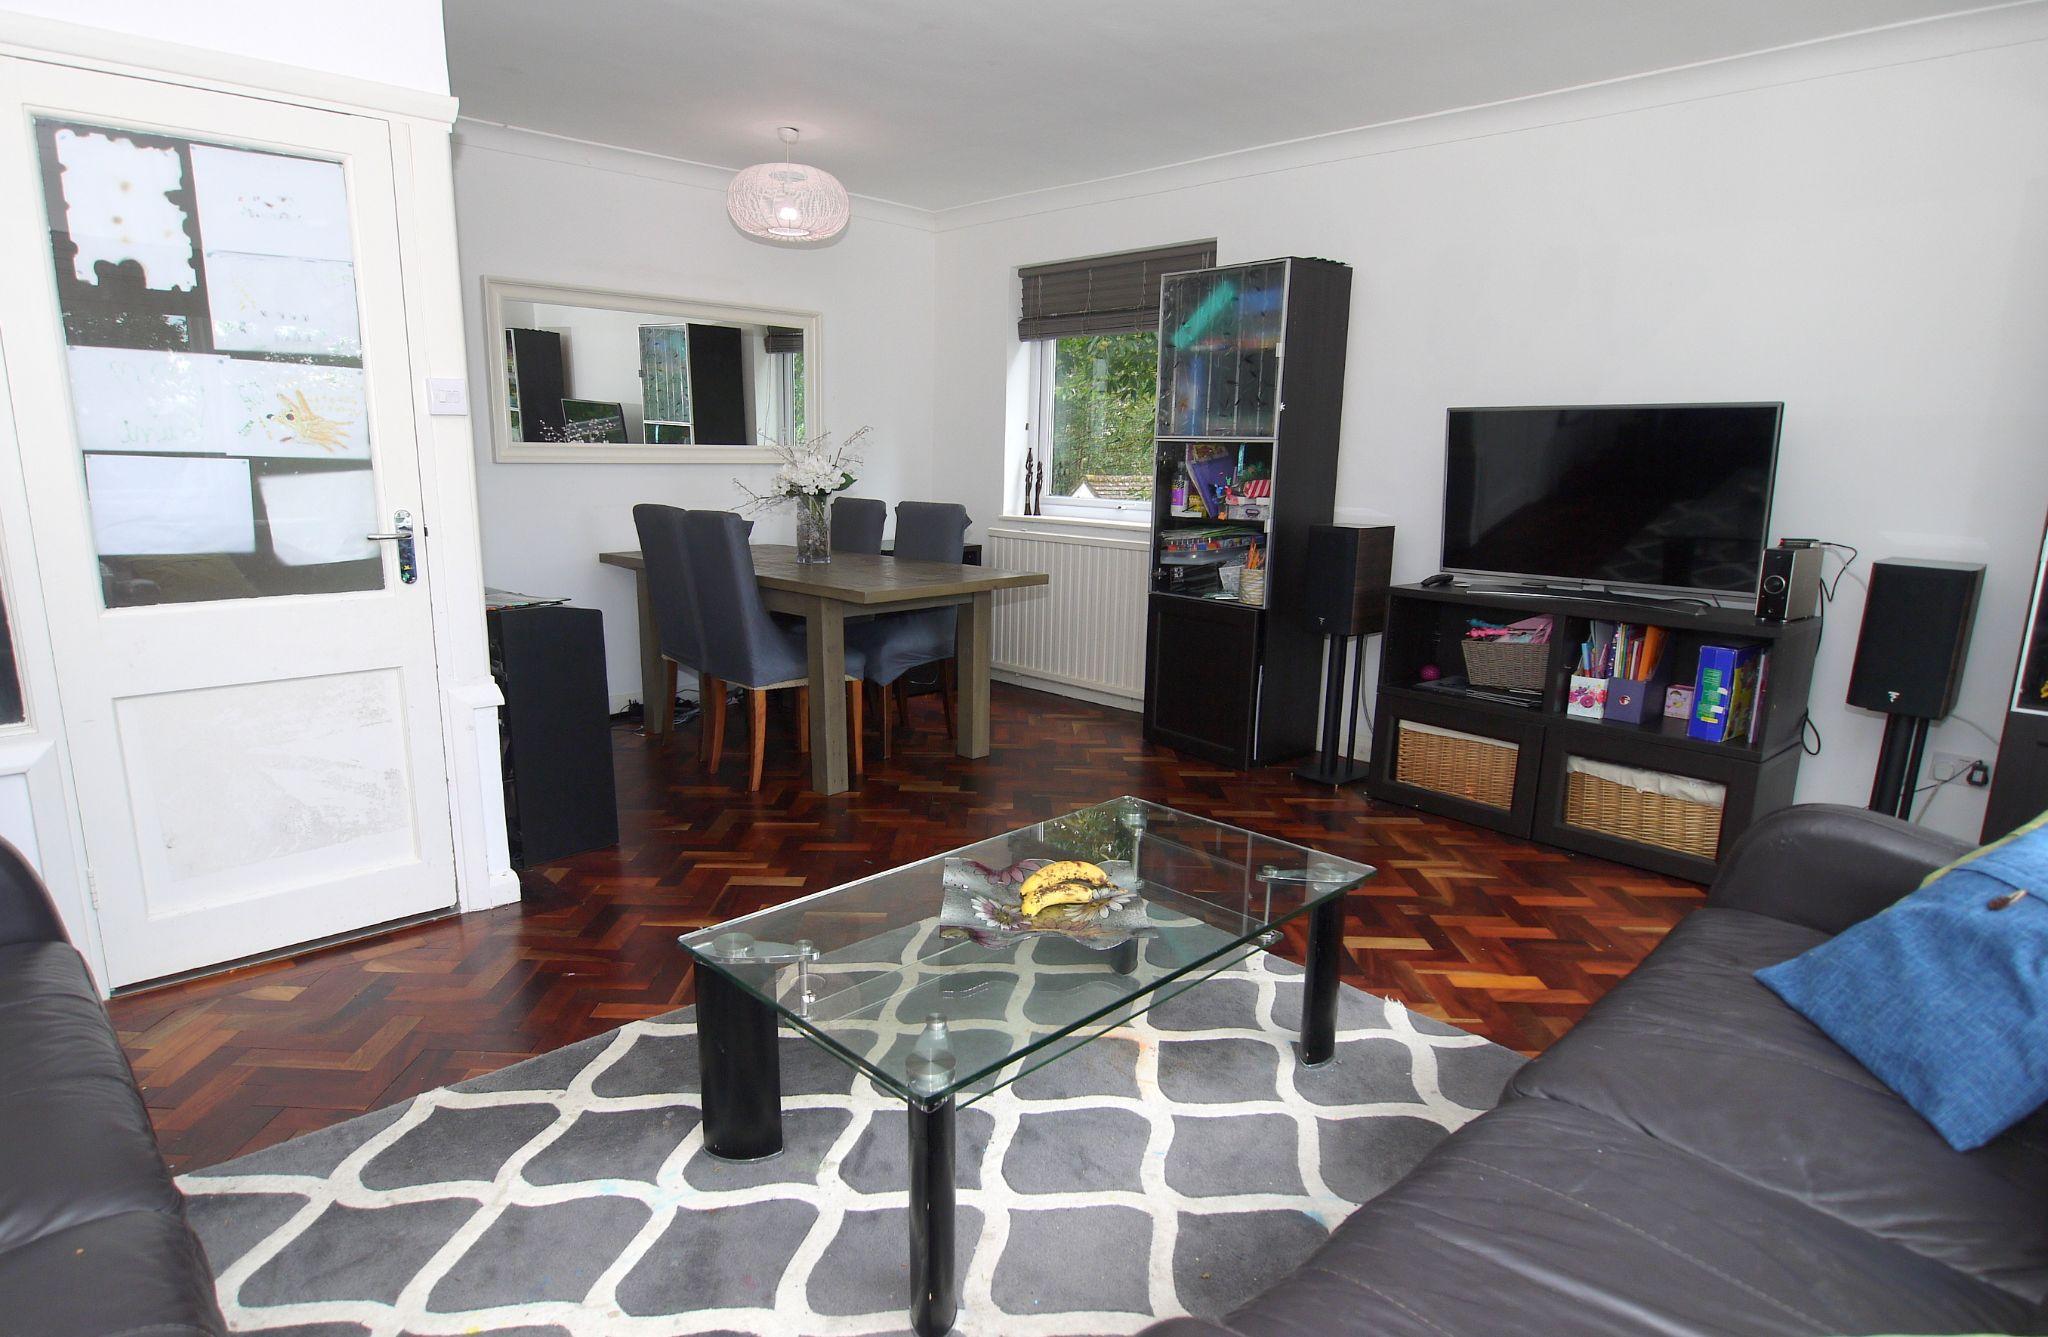 3 bedroom apartment Sold in Sevenoaks - Photograph 3